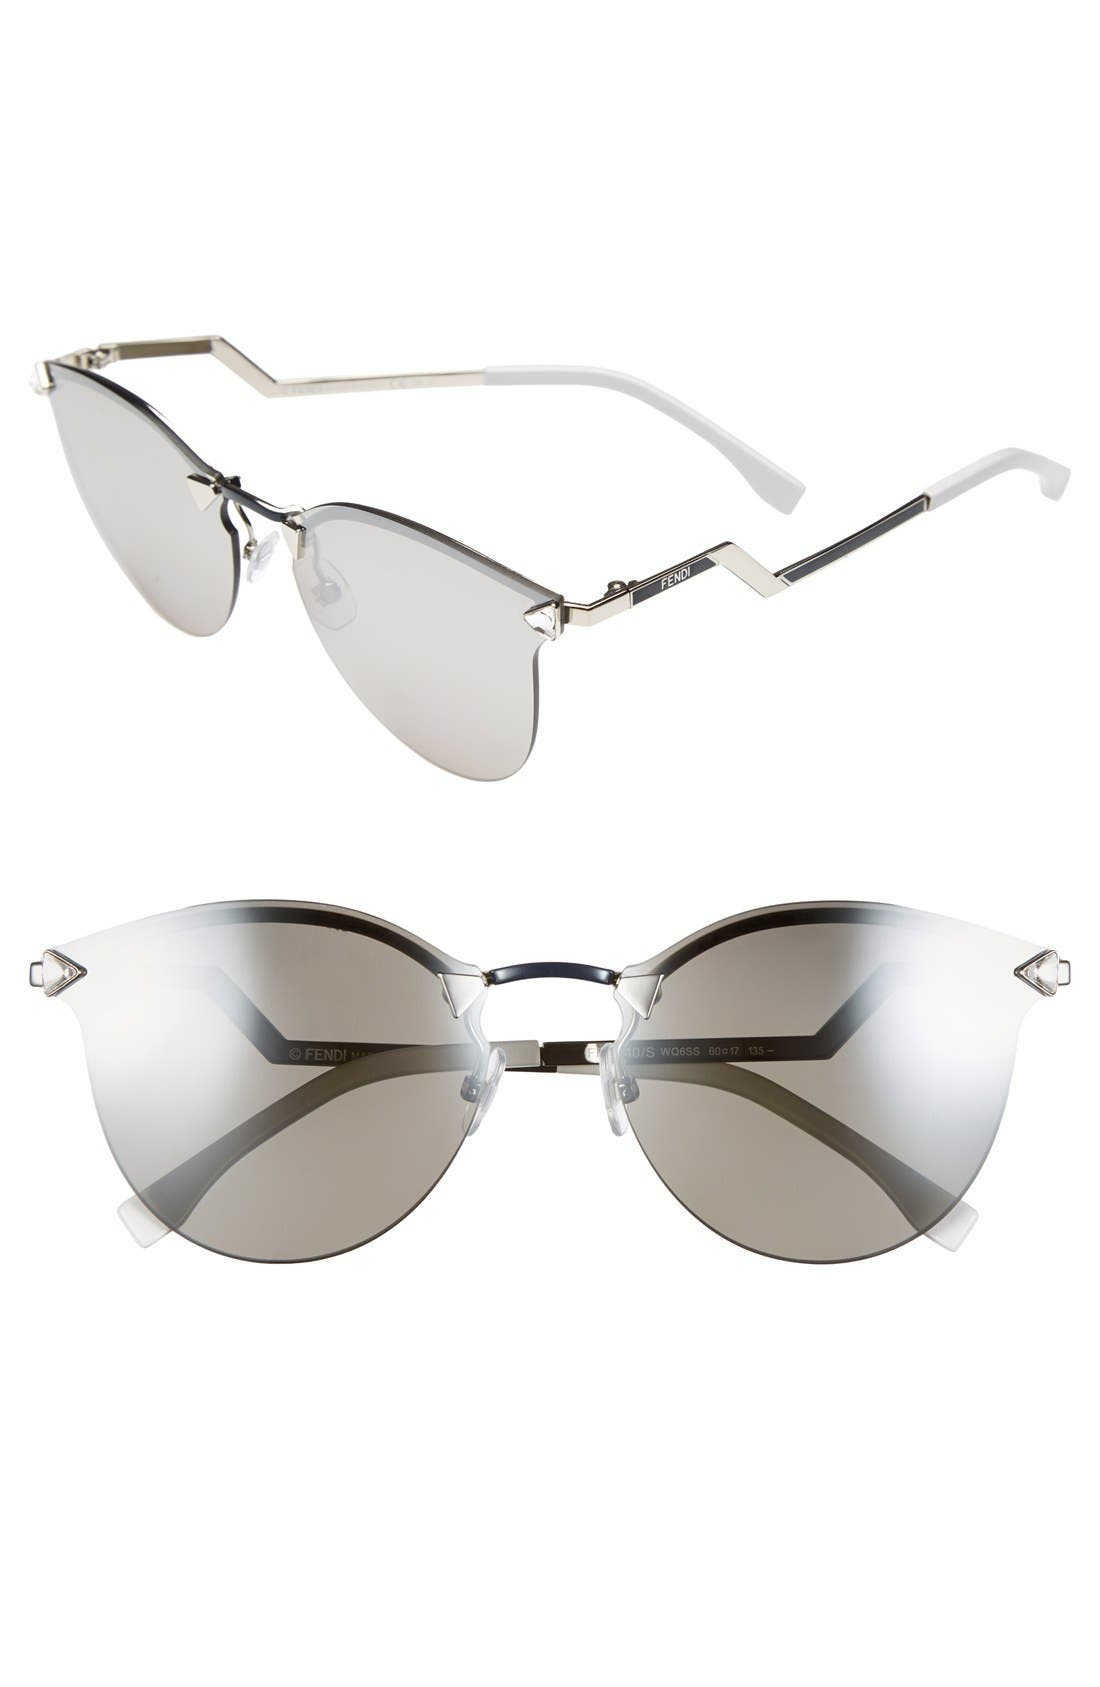 Alternate Image 1 Selected - Fendi 60mm Retro Sunglasses